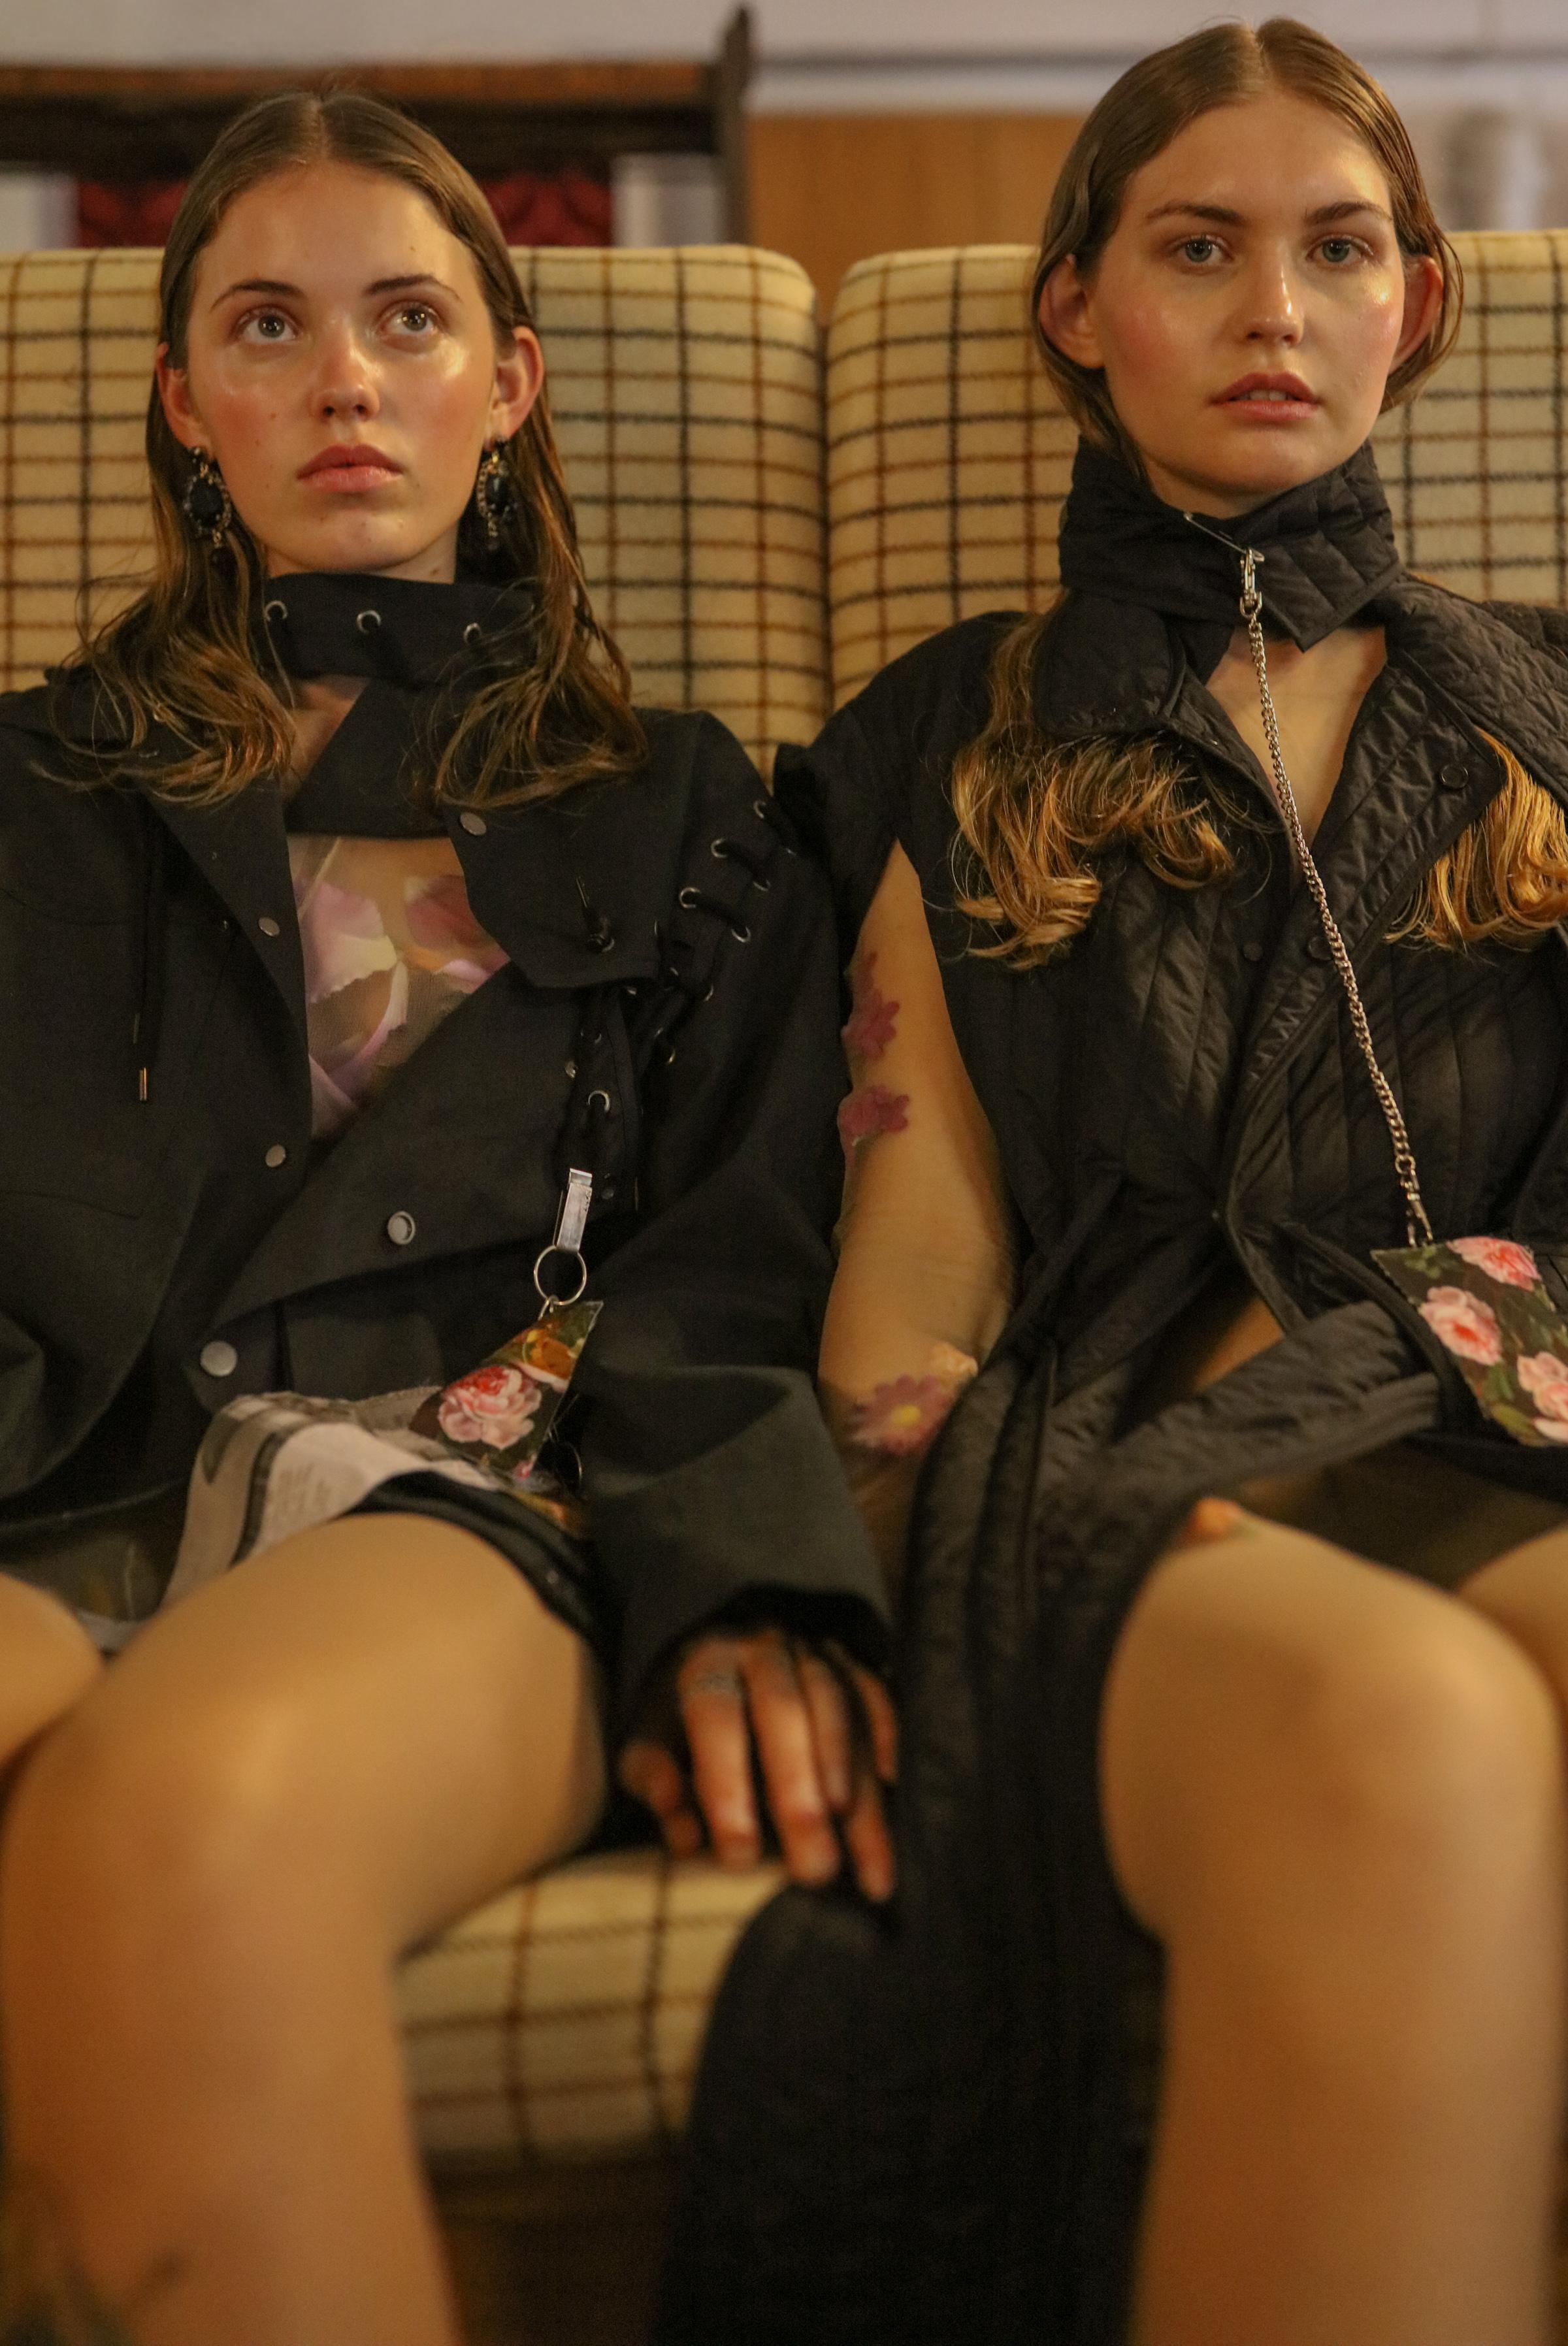 Sarah & Kymberley wears Samantha Diorio & Jake Paraskeva accessory tags